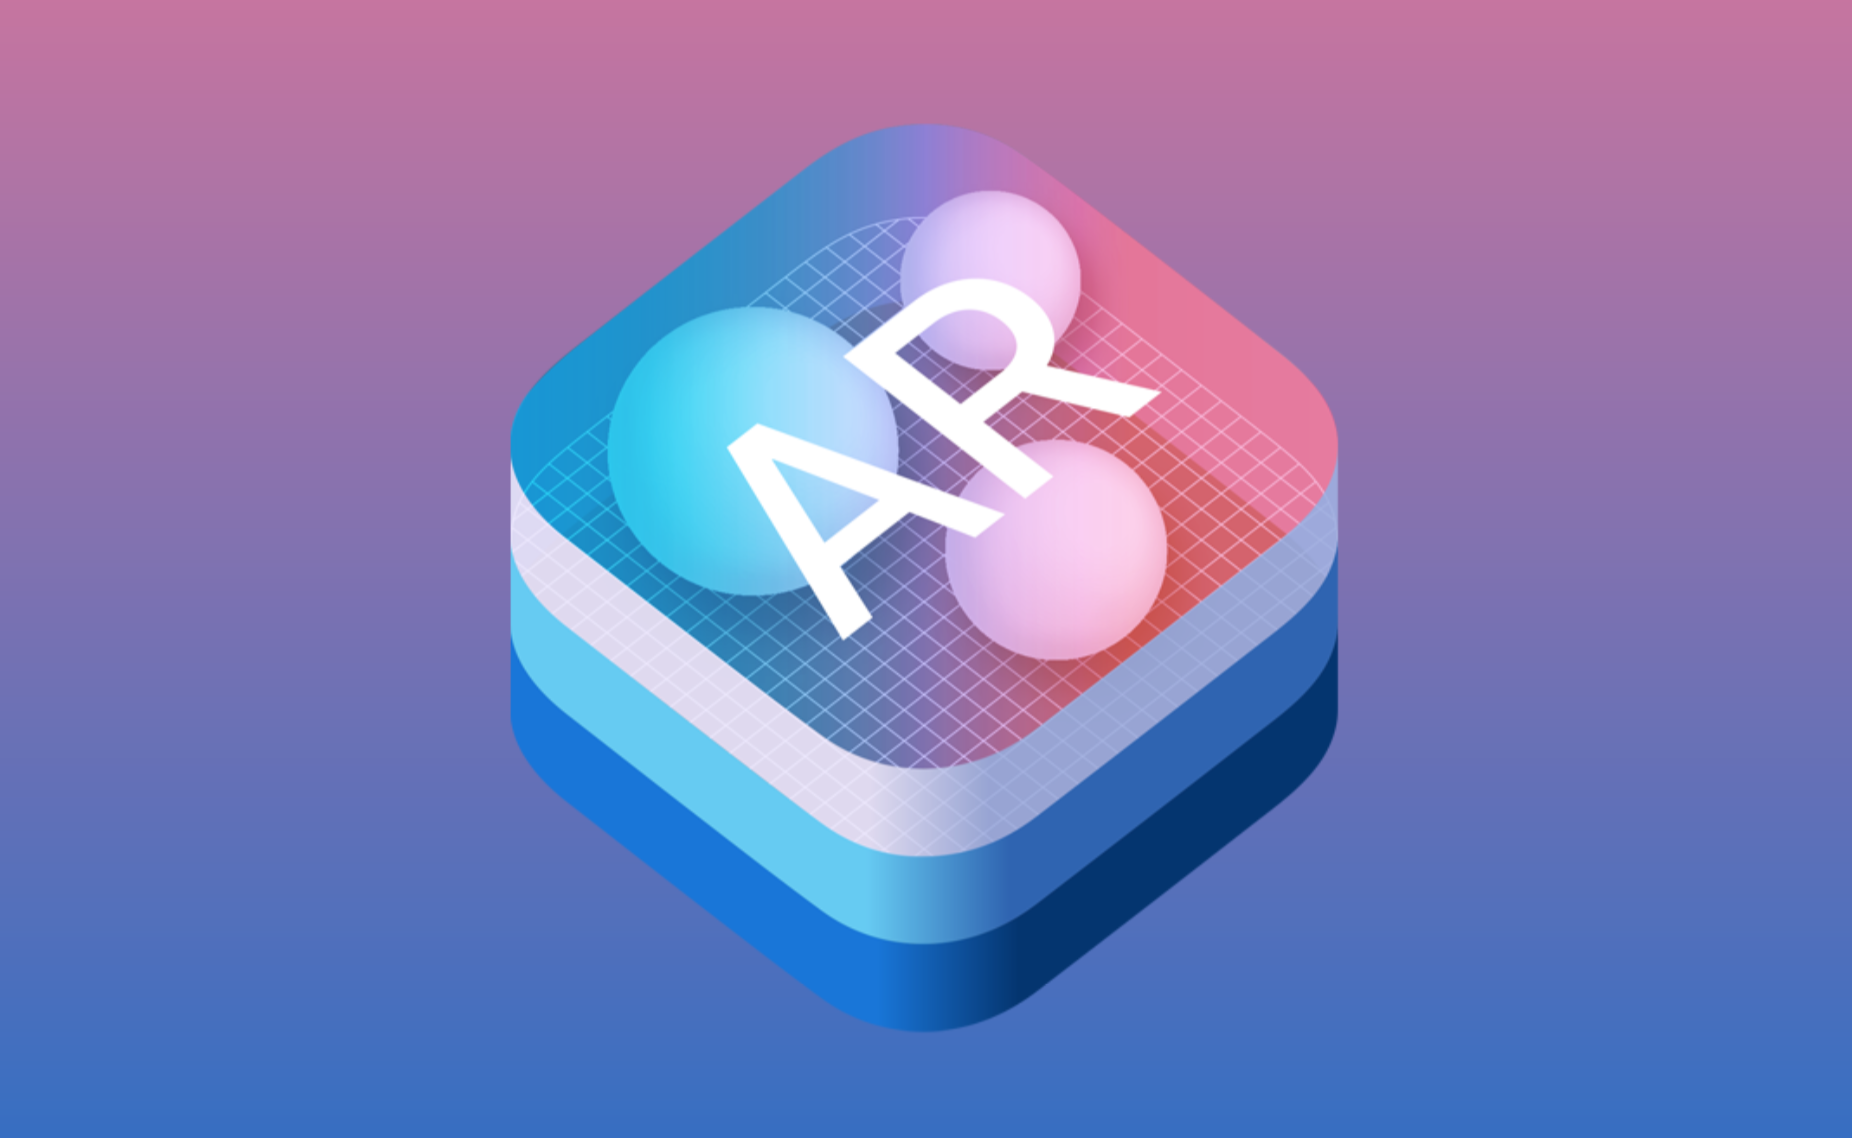 Apple's AR bet still has a lot to prove  Lucas Matney     7 hours